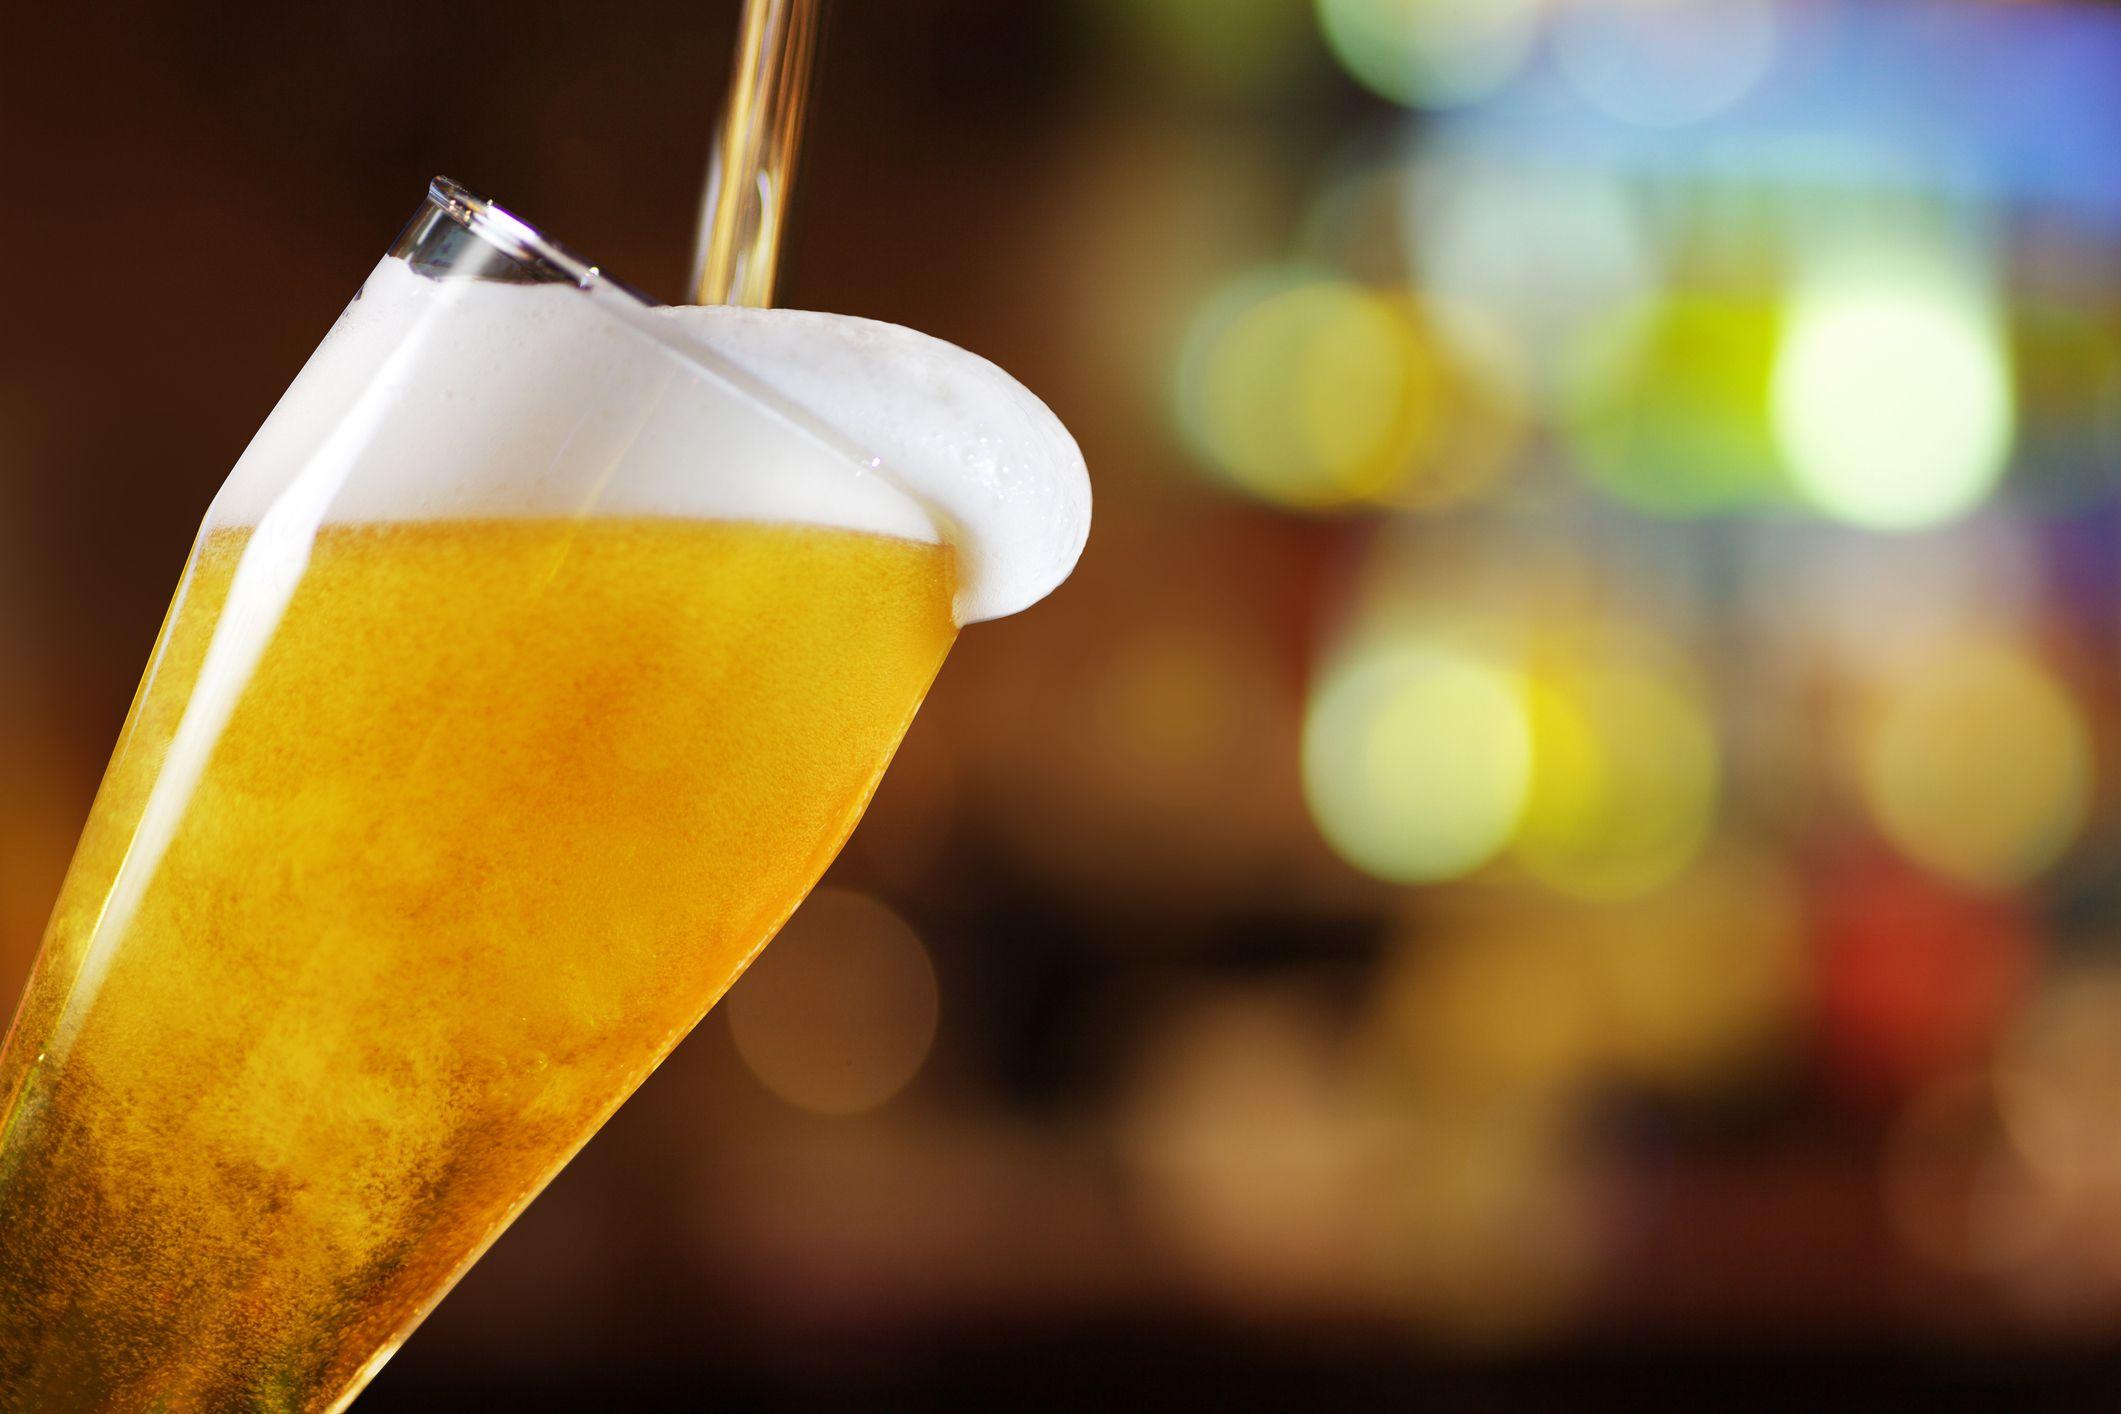 dos equis beer percentage